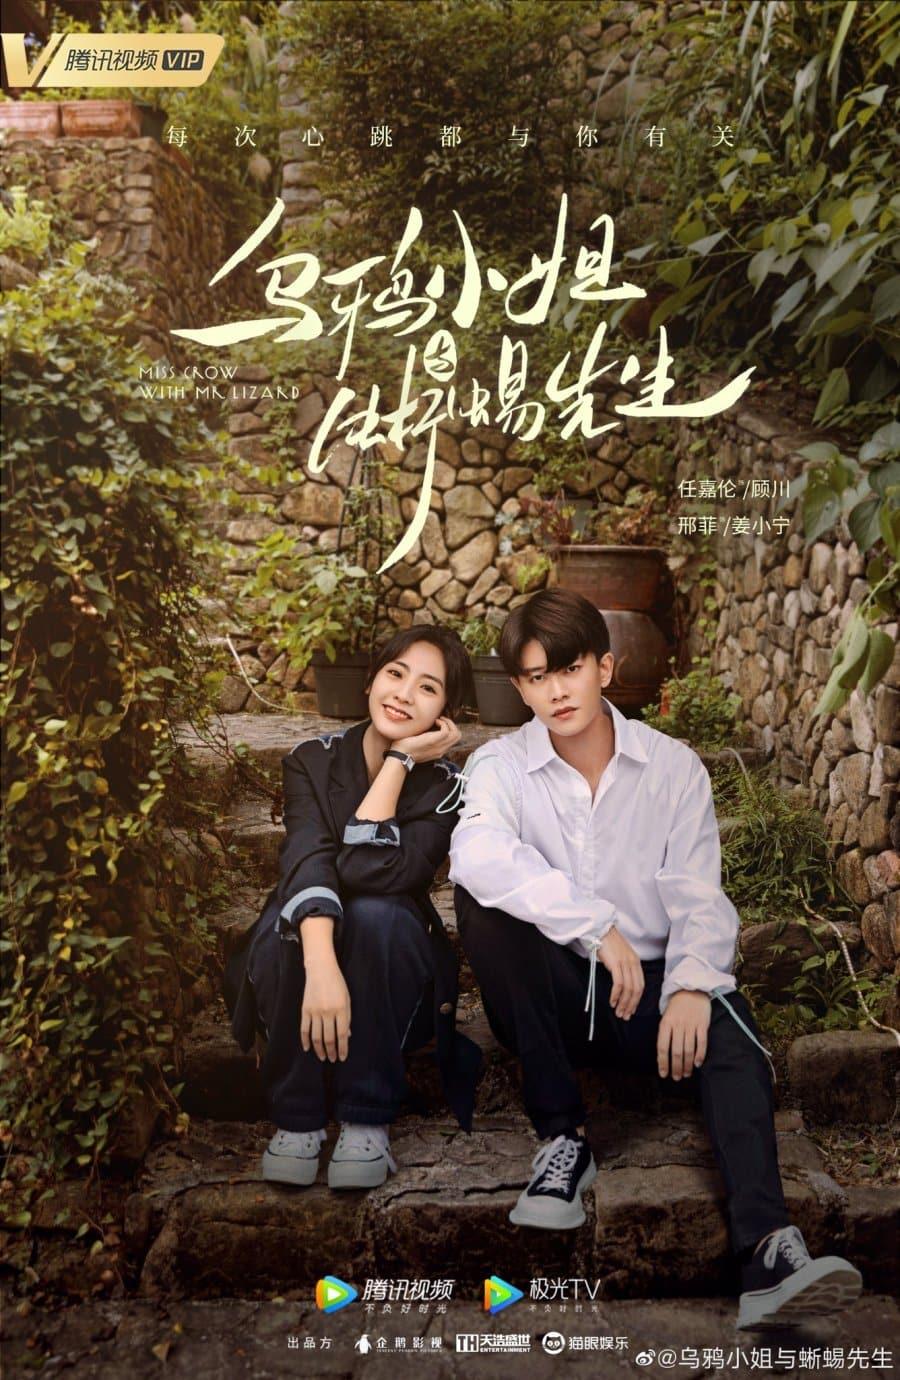 Miss Crow with Mr.Lizard (2021) กระตุกรัก หัวใจไฟช็อต ซับไทย EP1-EP36